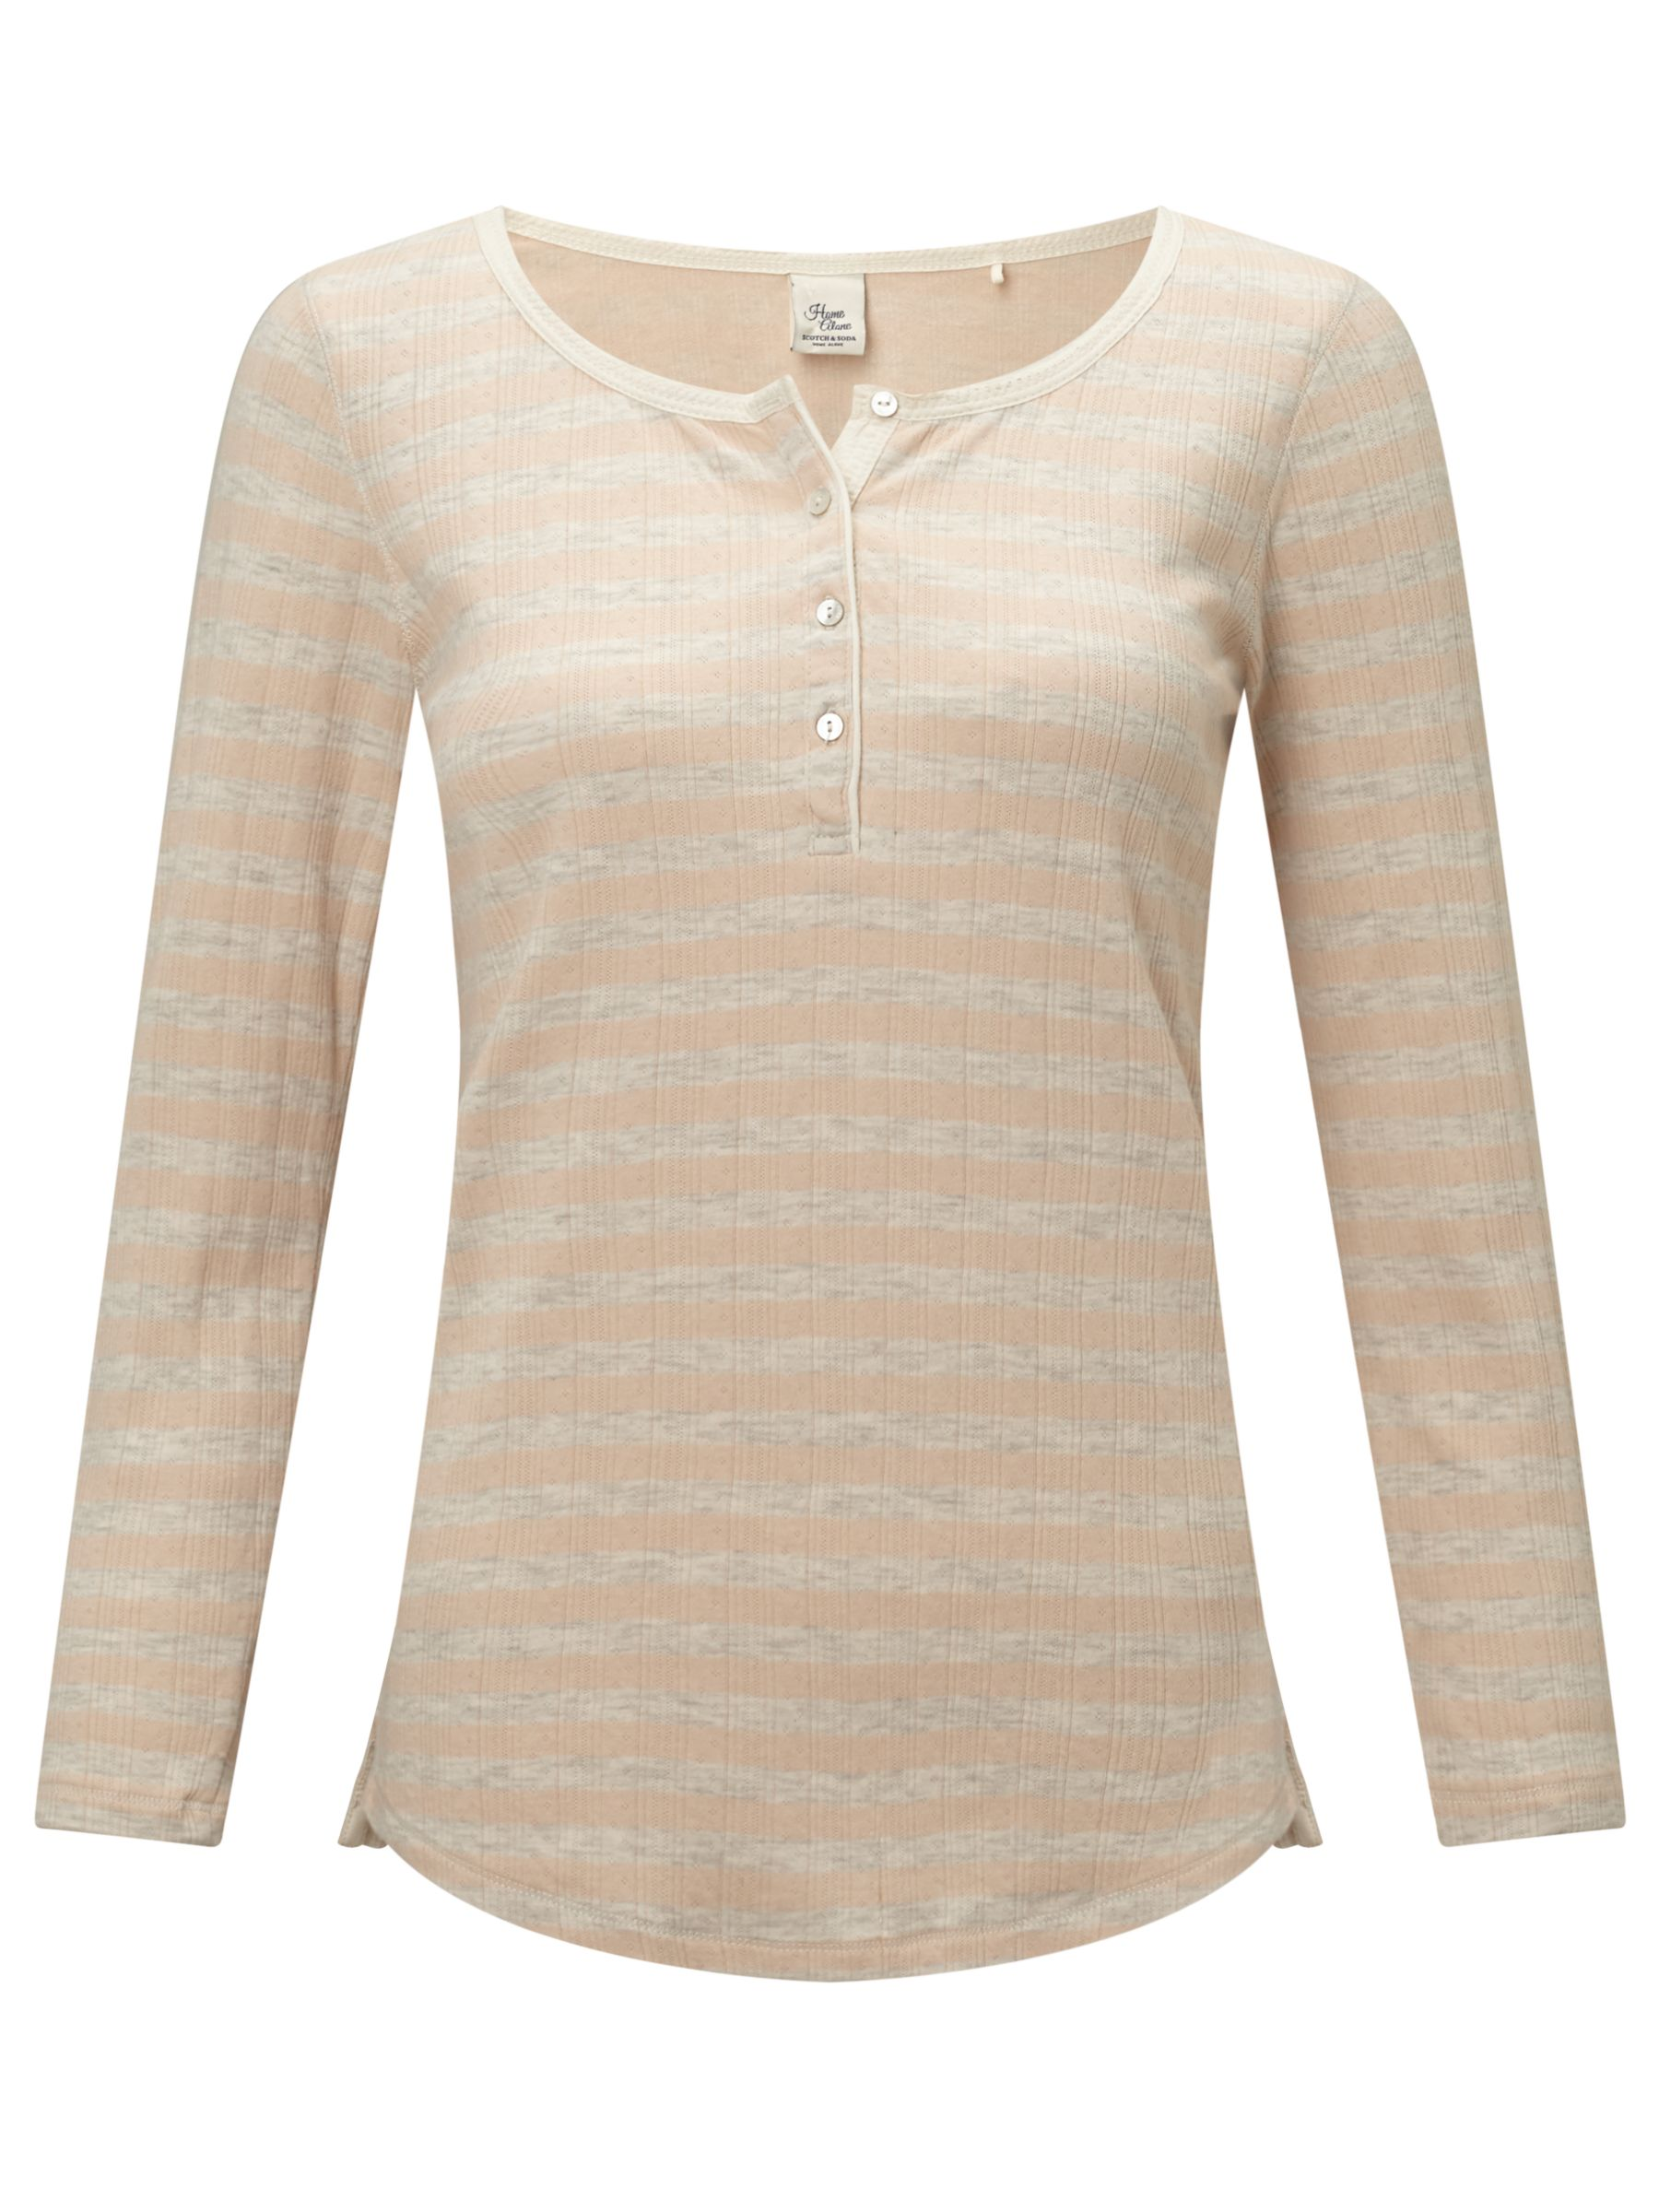 Maison Scotch Maison Scotch Home Alone Stripe Grandad T-Shirt, Peach Melange